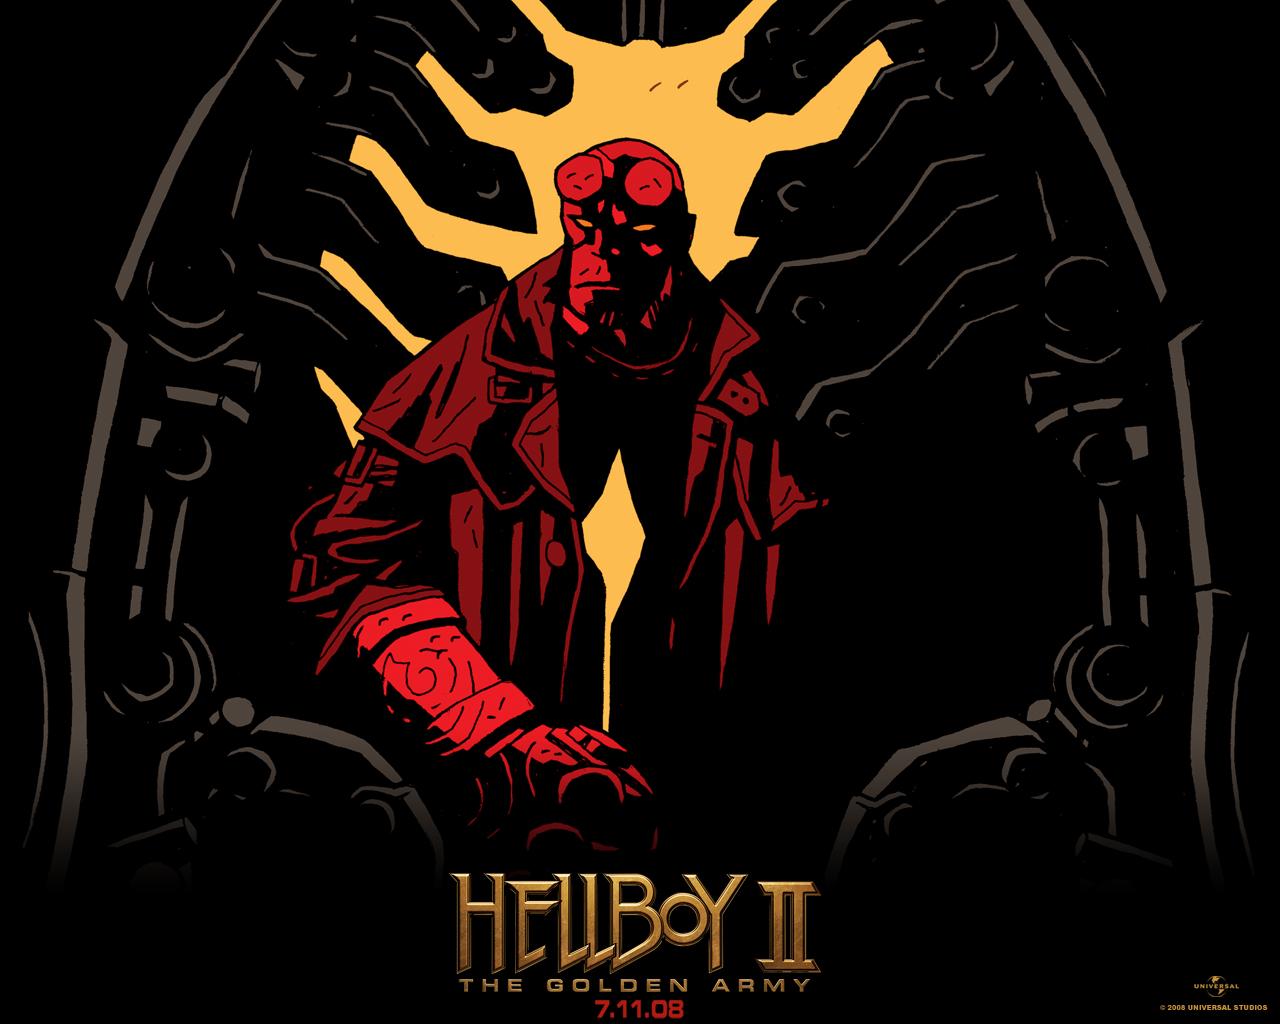 hellboy wallpaper 18